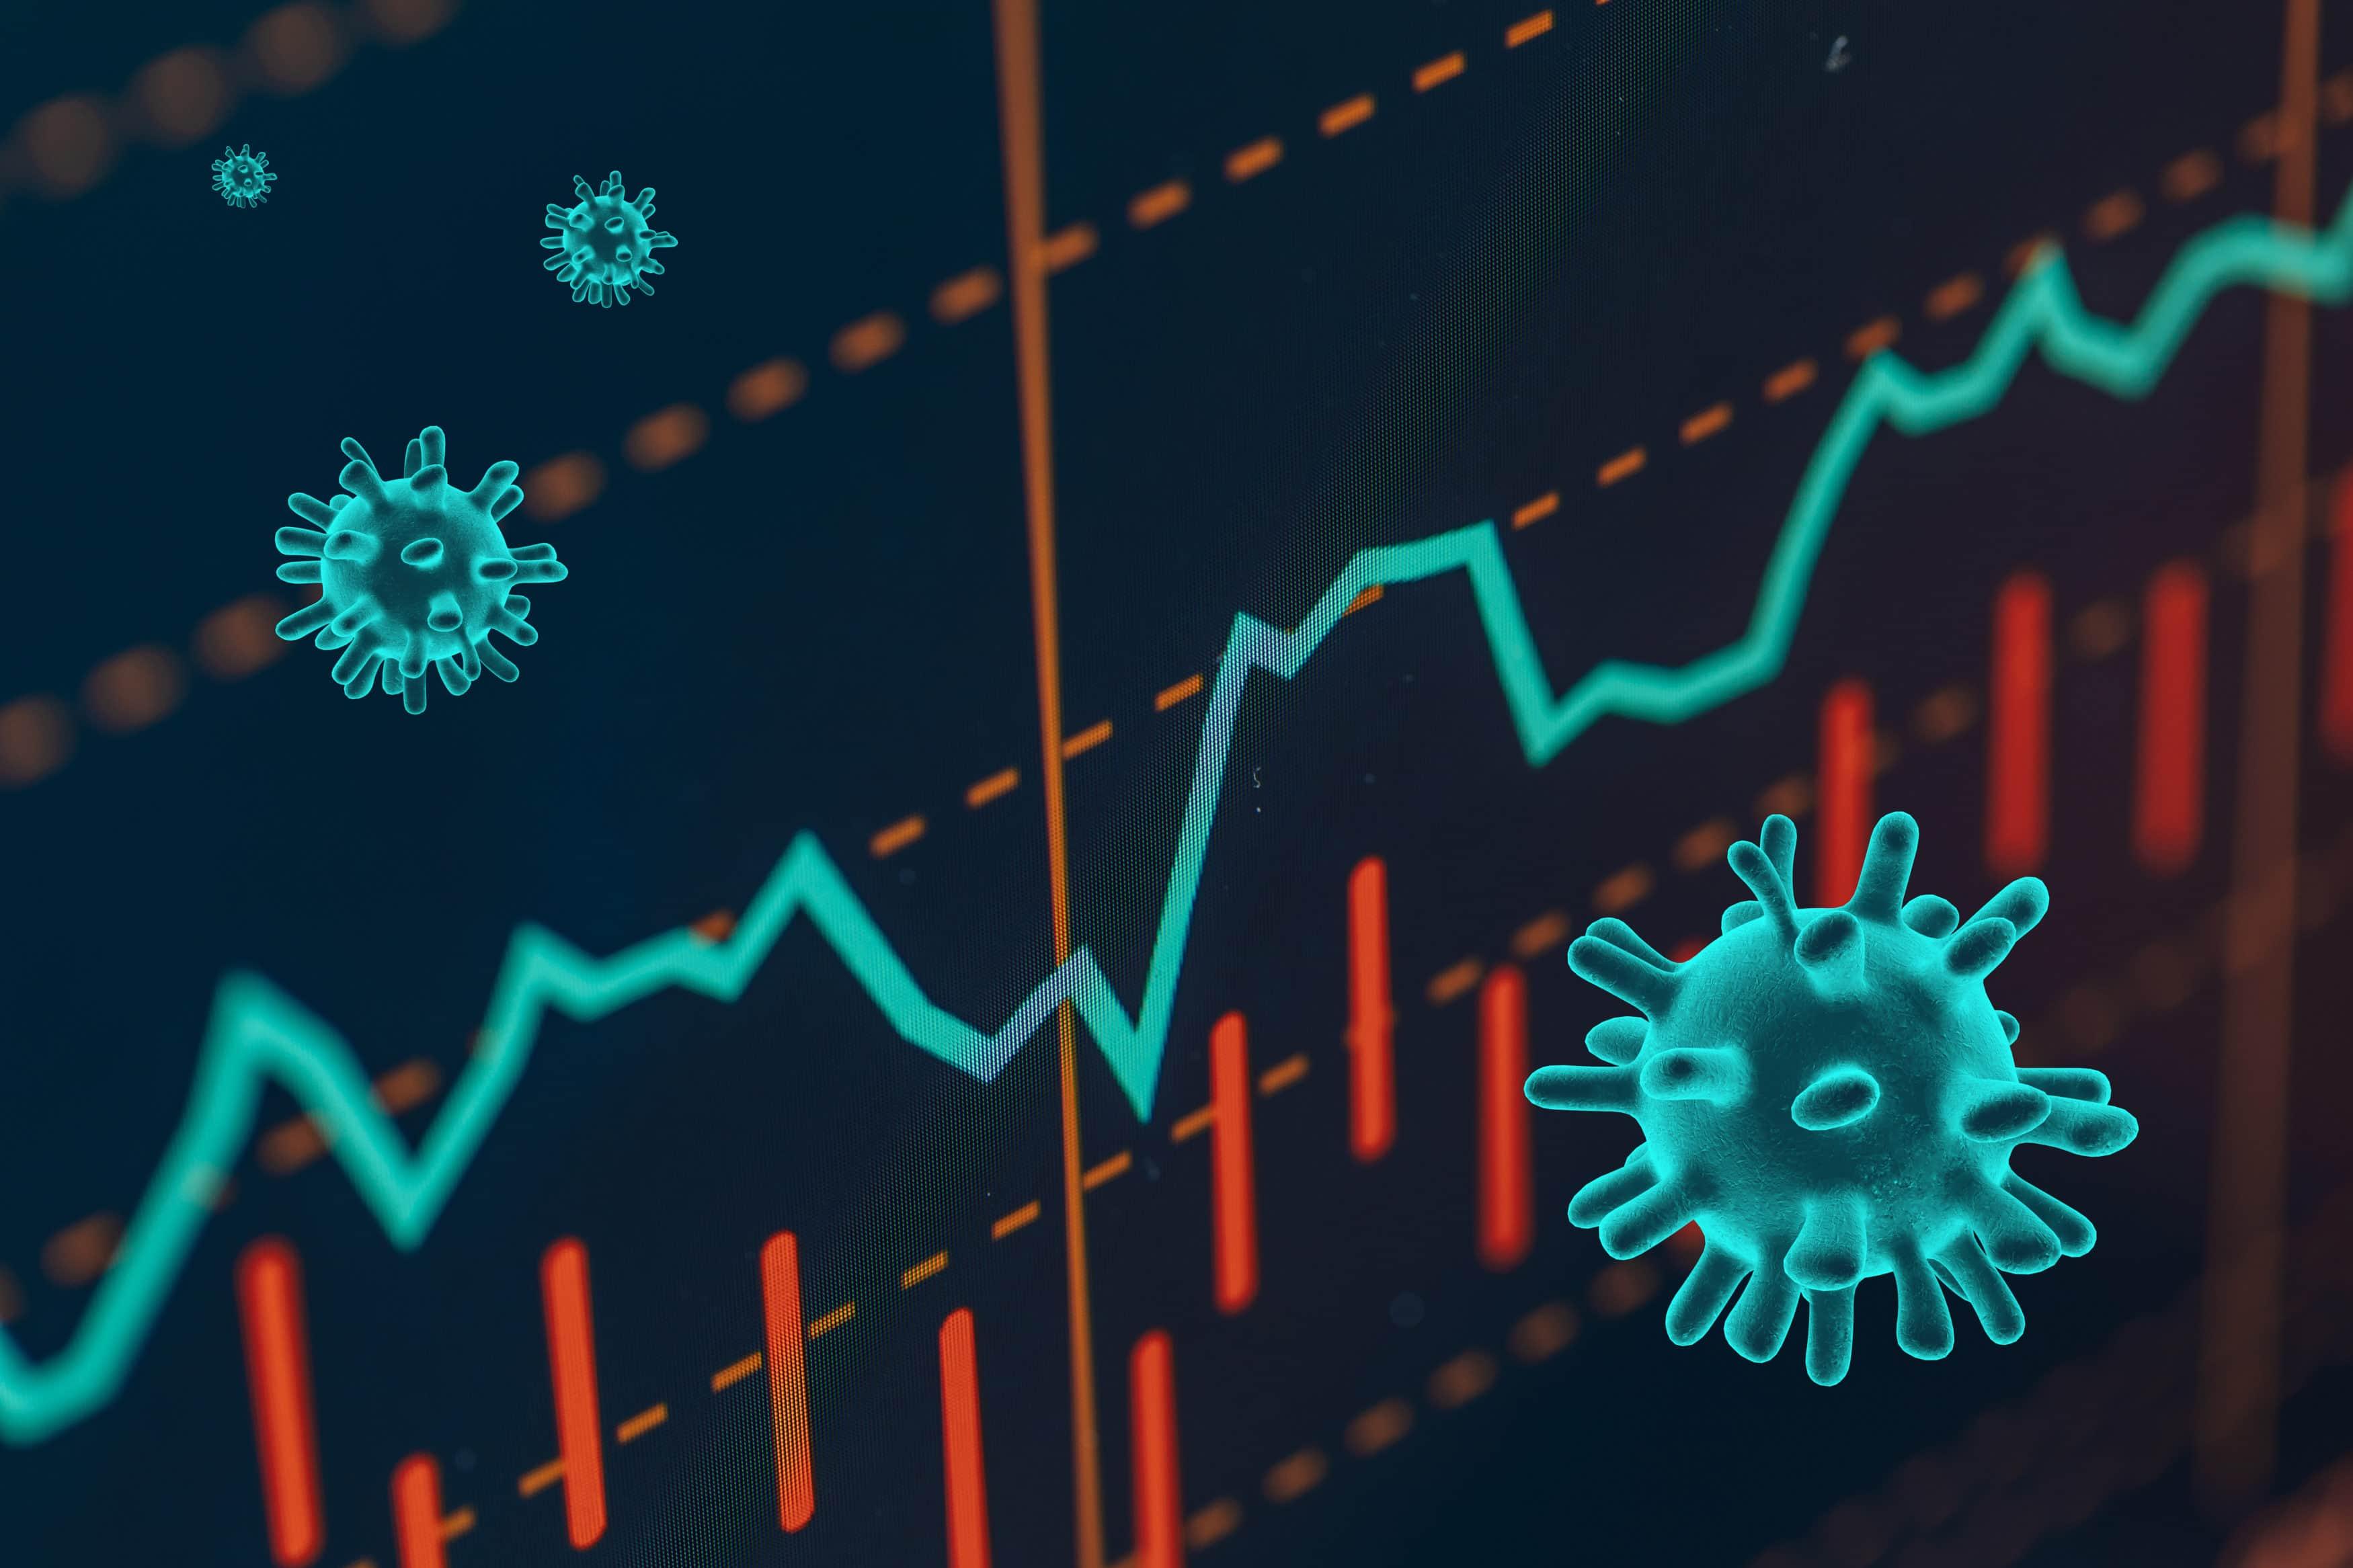 The coronavirus sinks the global stock exchanges.